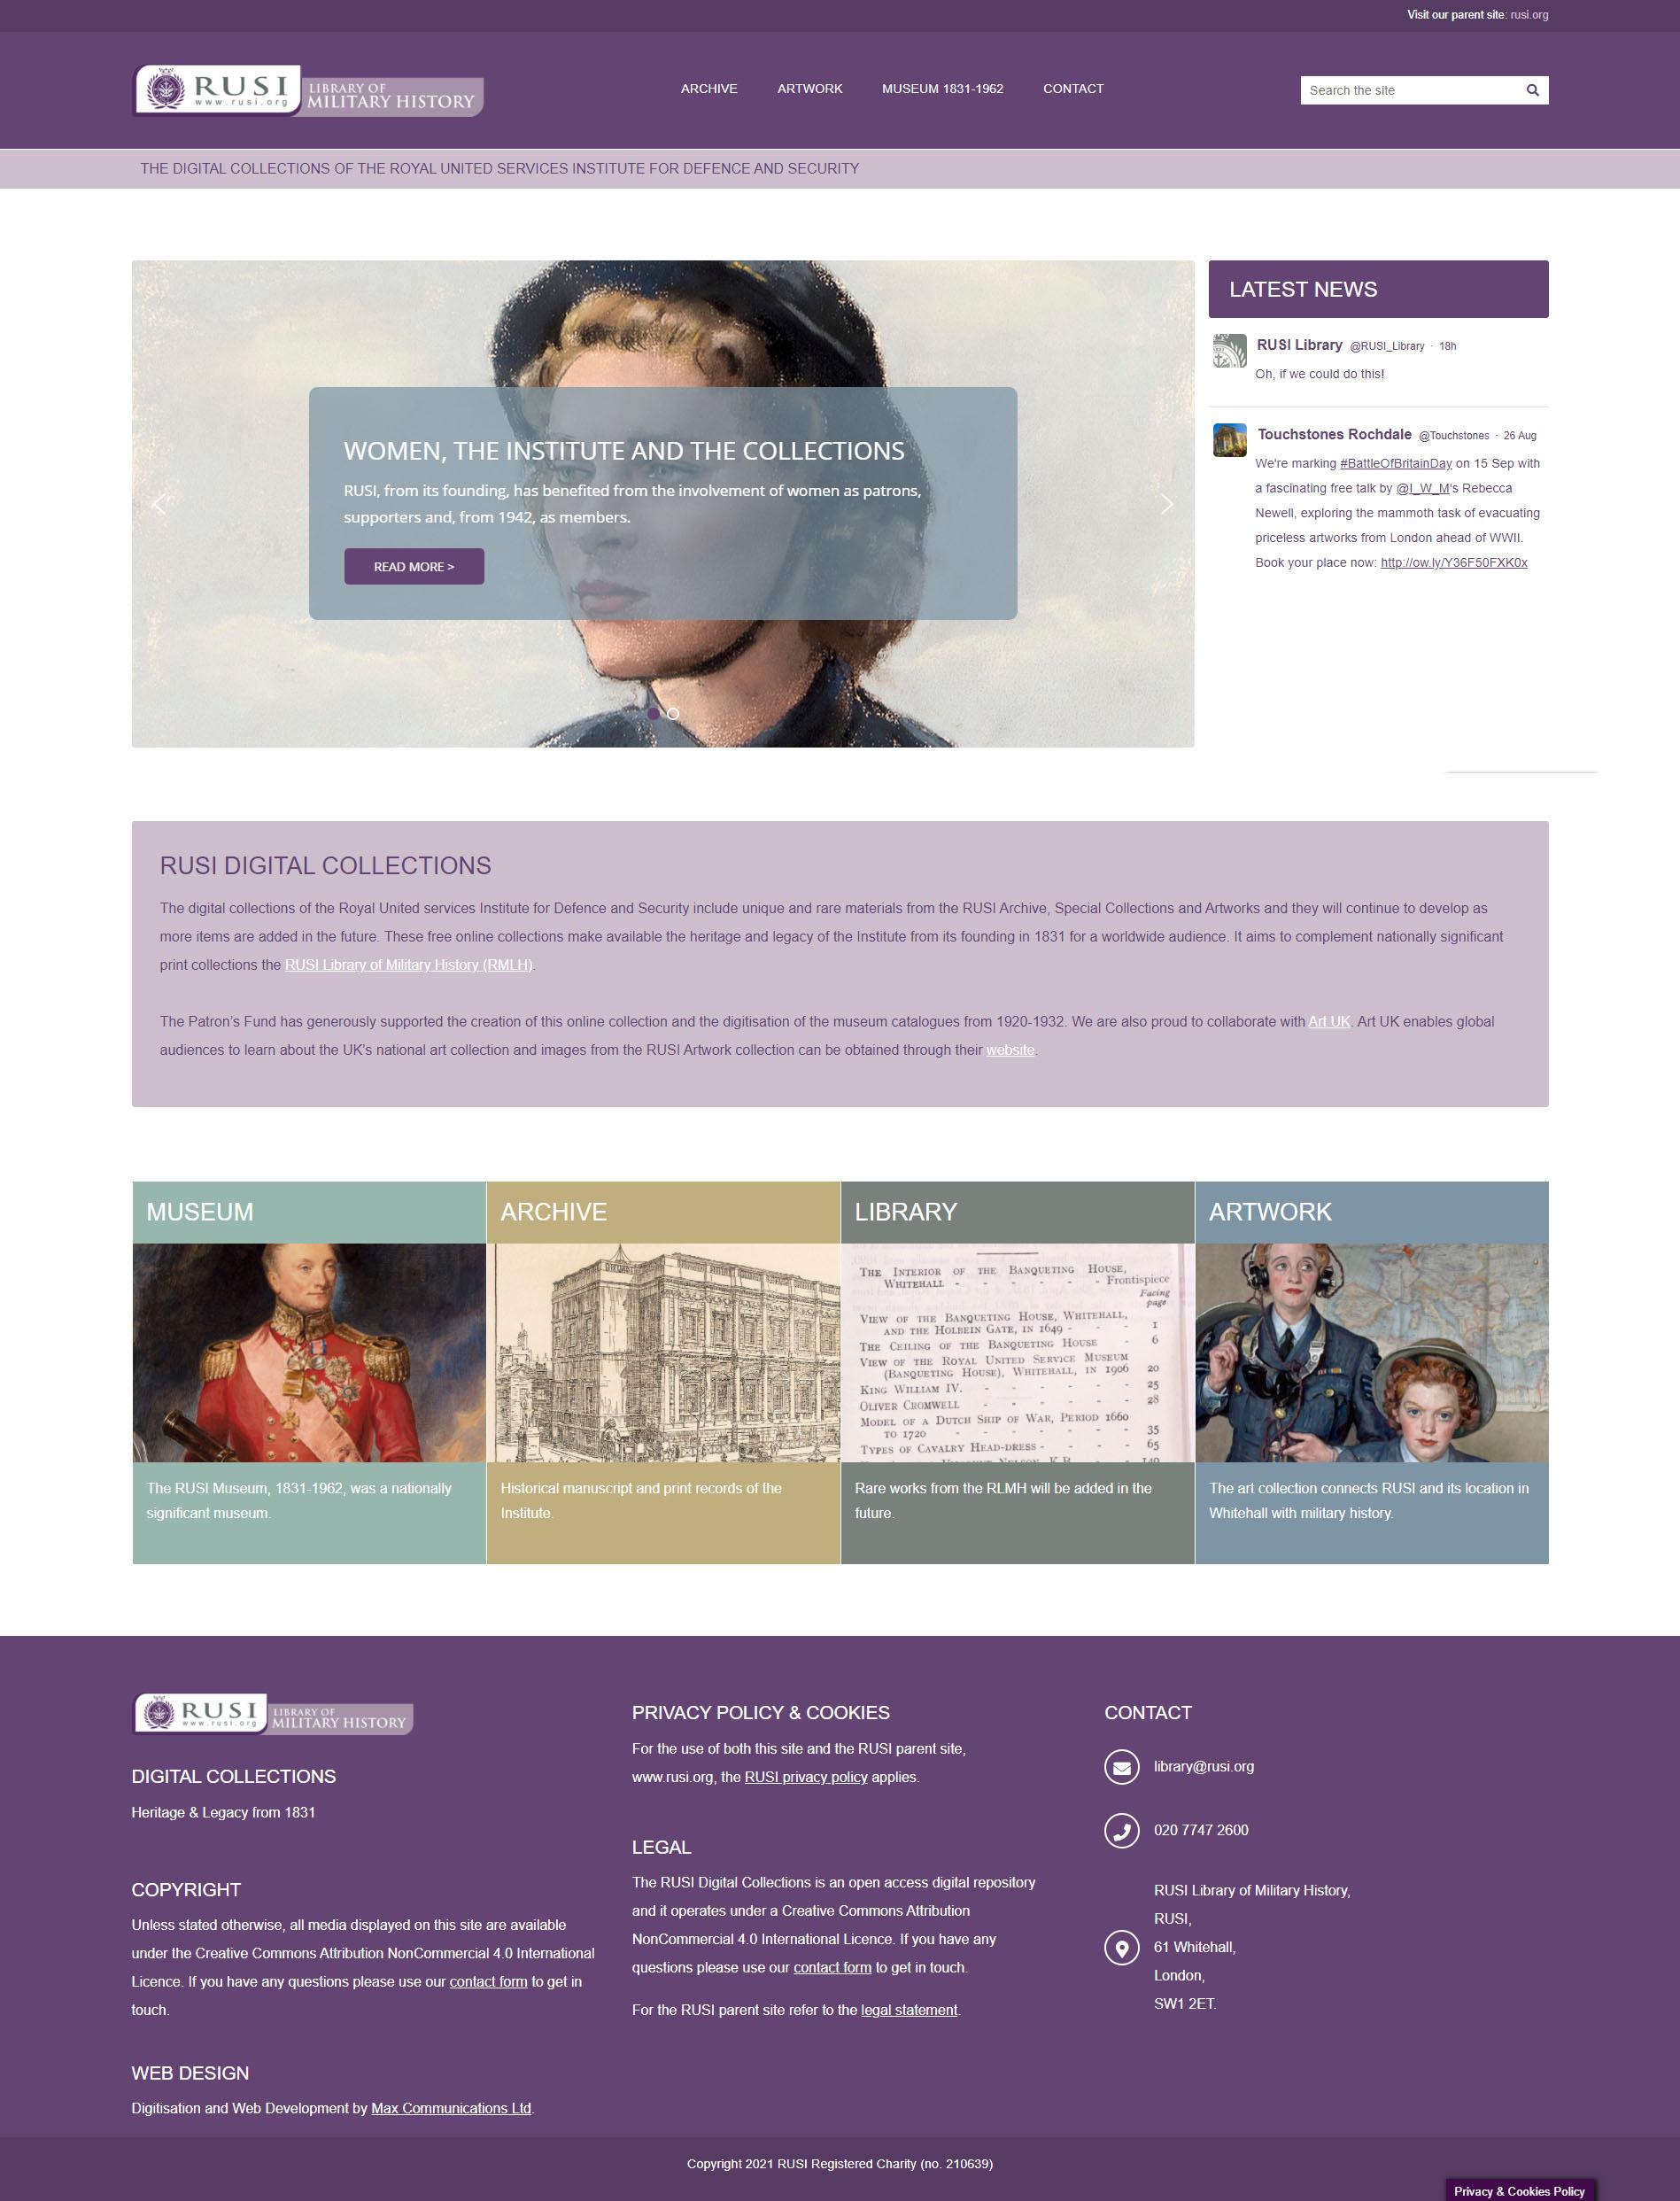 Royal united Services Institute (RUSI) Archive Website screenshot